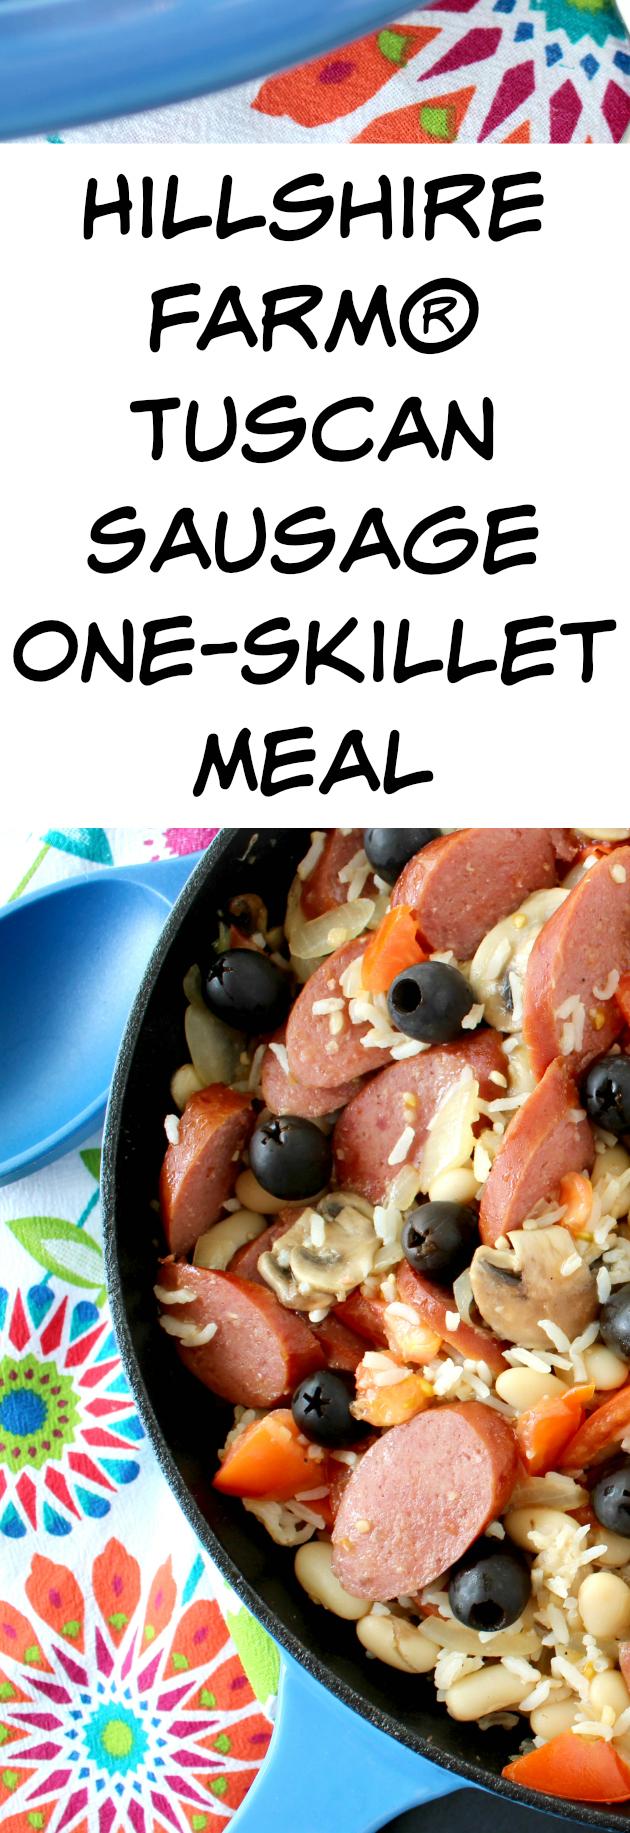 Hillshire Farm® Tuscan Sausage One-Skillet Meal